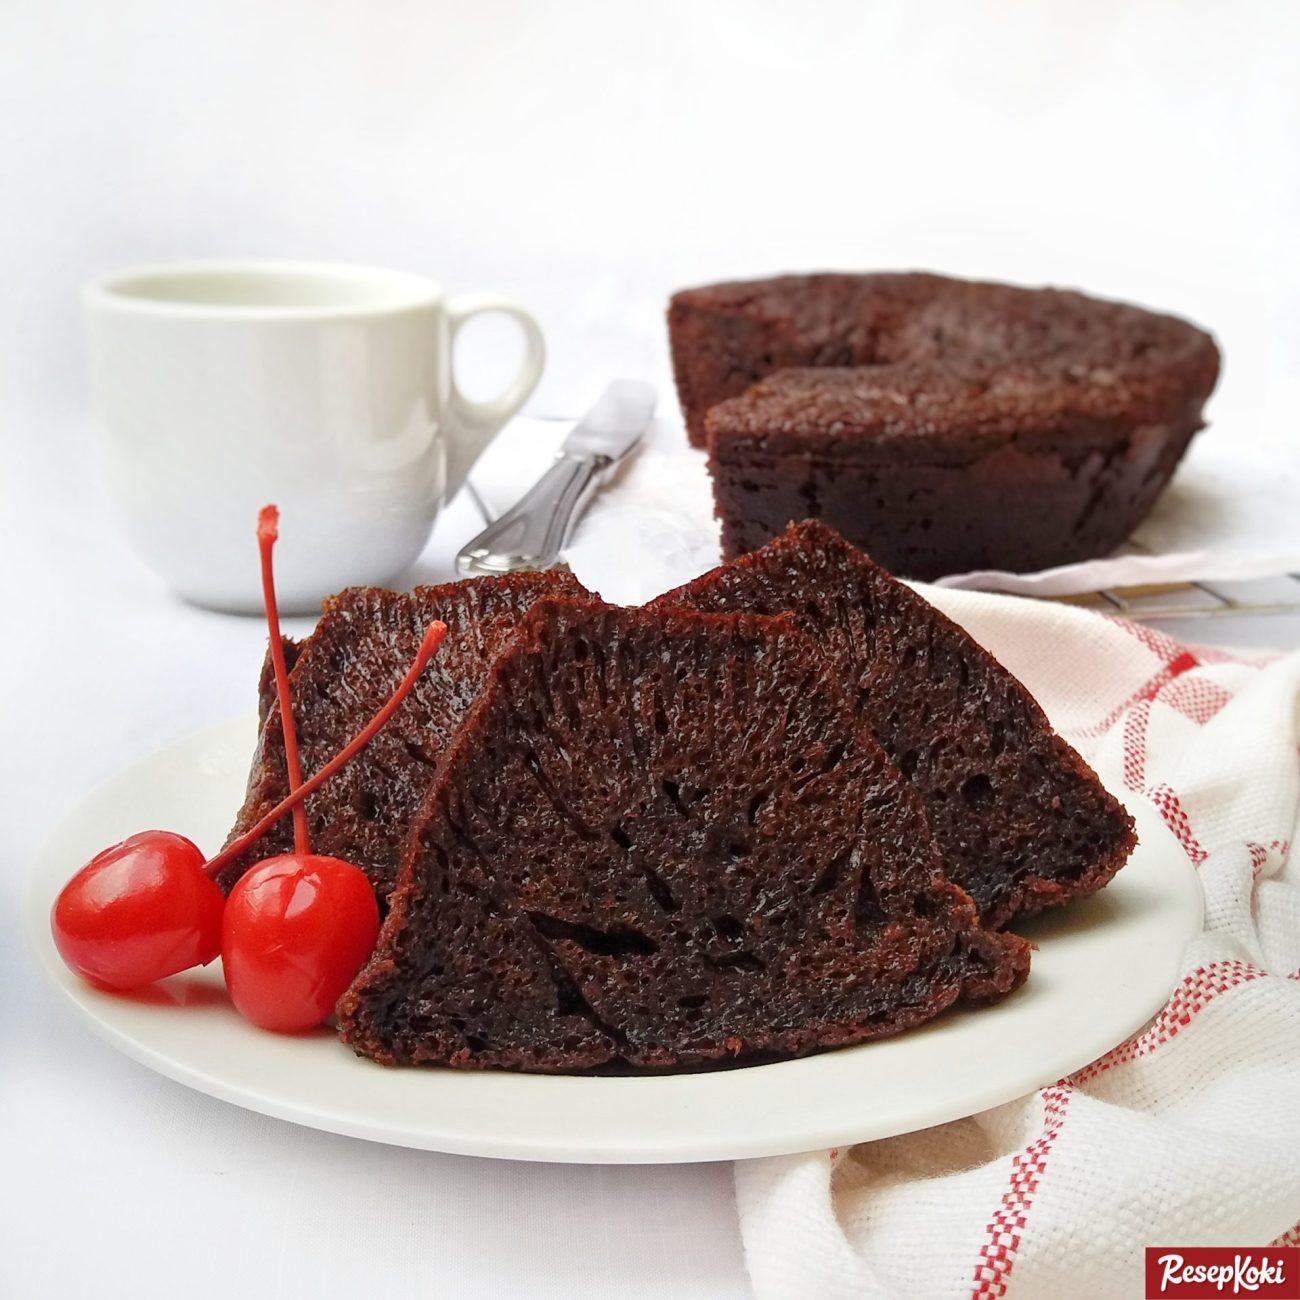 Resep Kue Bolu Sarang Semut Caramel Cake